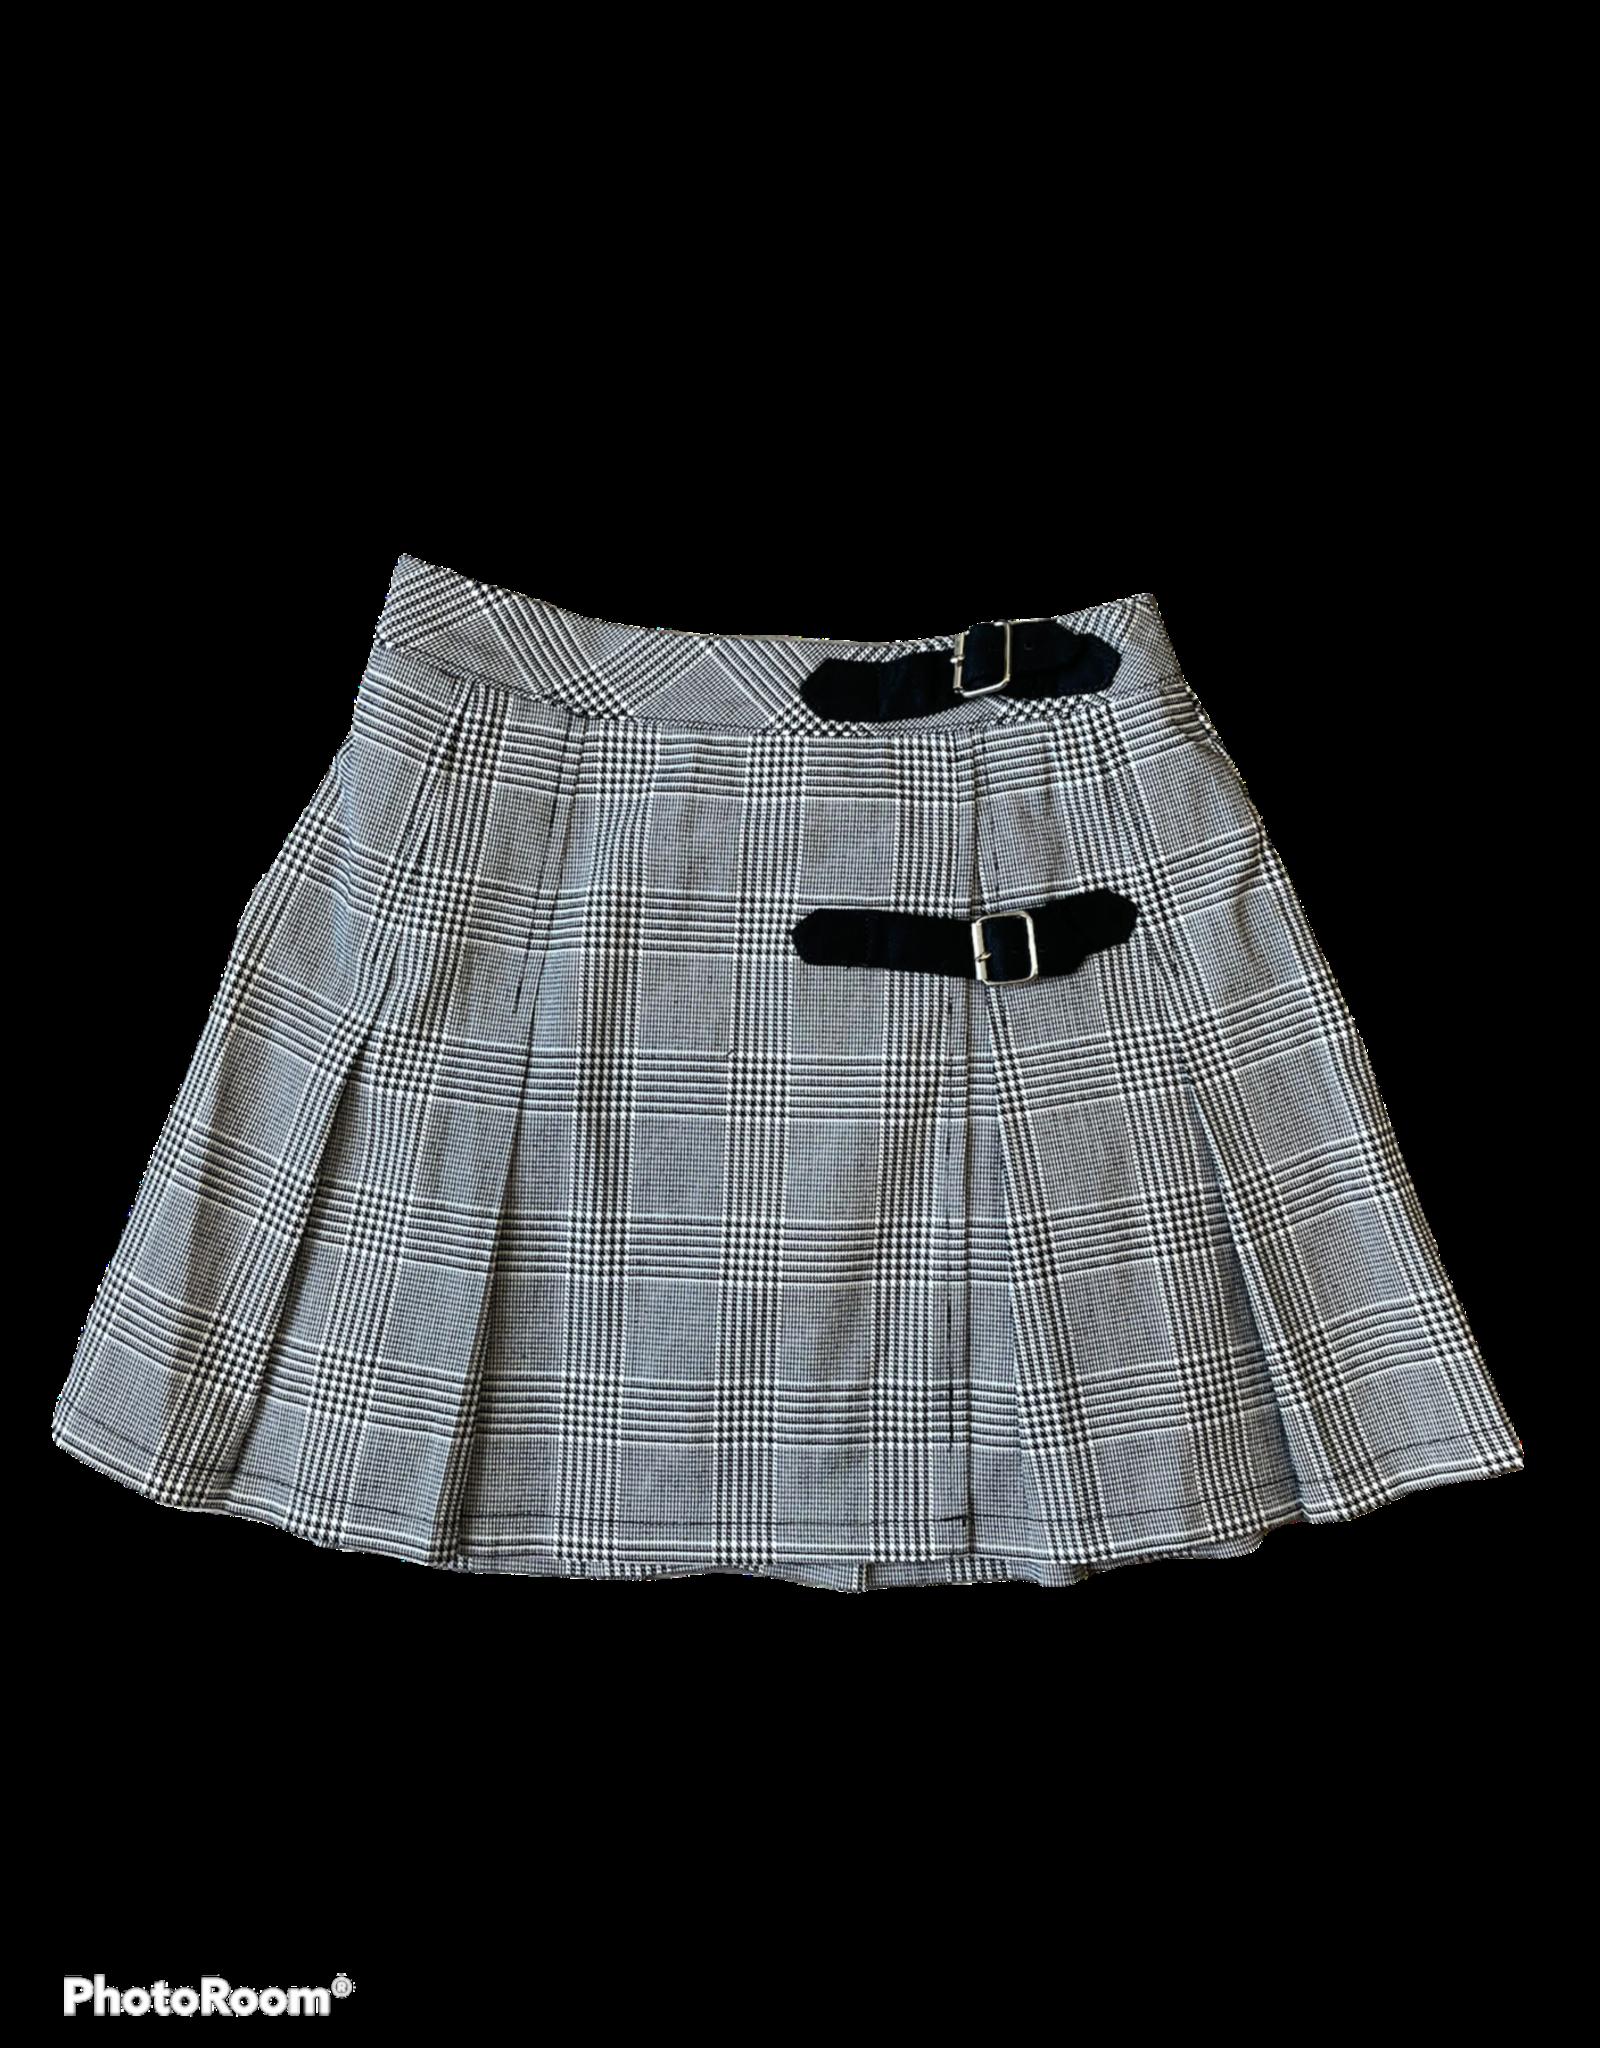 KATIEJNYC KJ Brittany Skirt